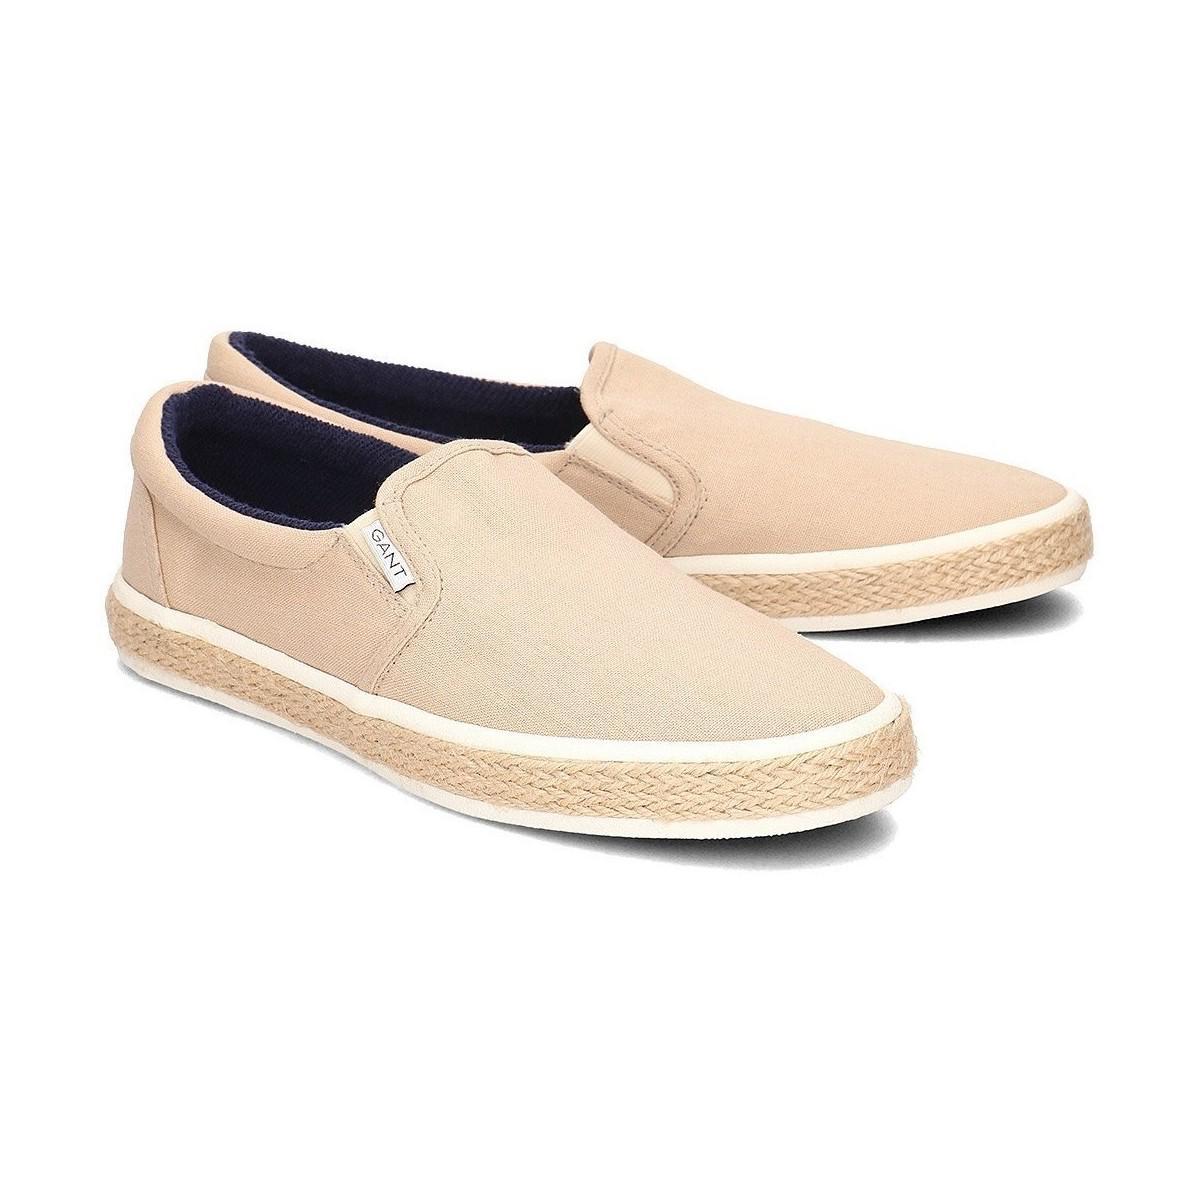 2c93f363fb GANT Master Men's Espadrilles / Casual Shoes In Beige in Natural for ...